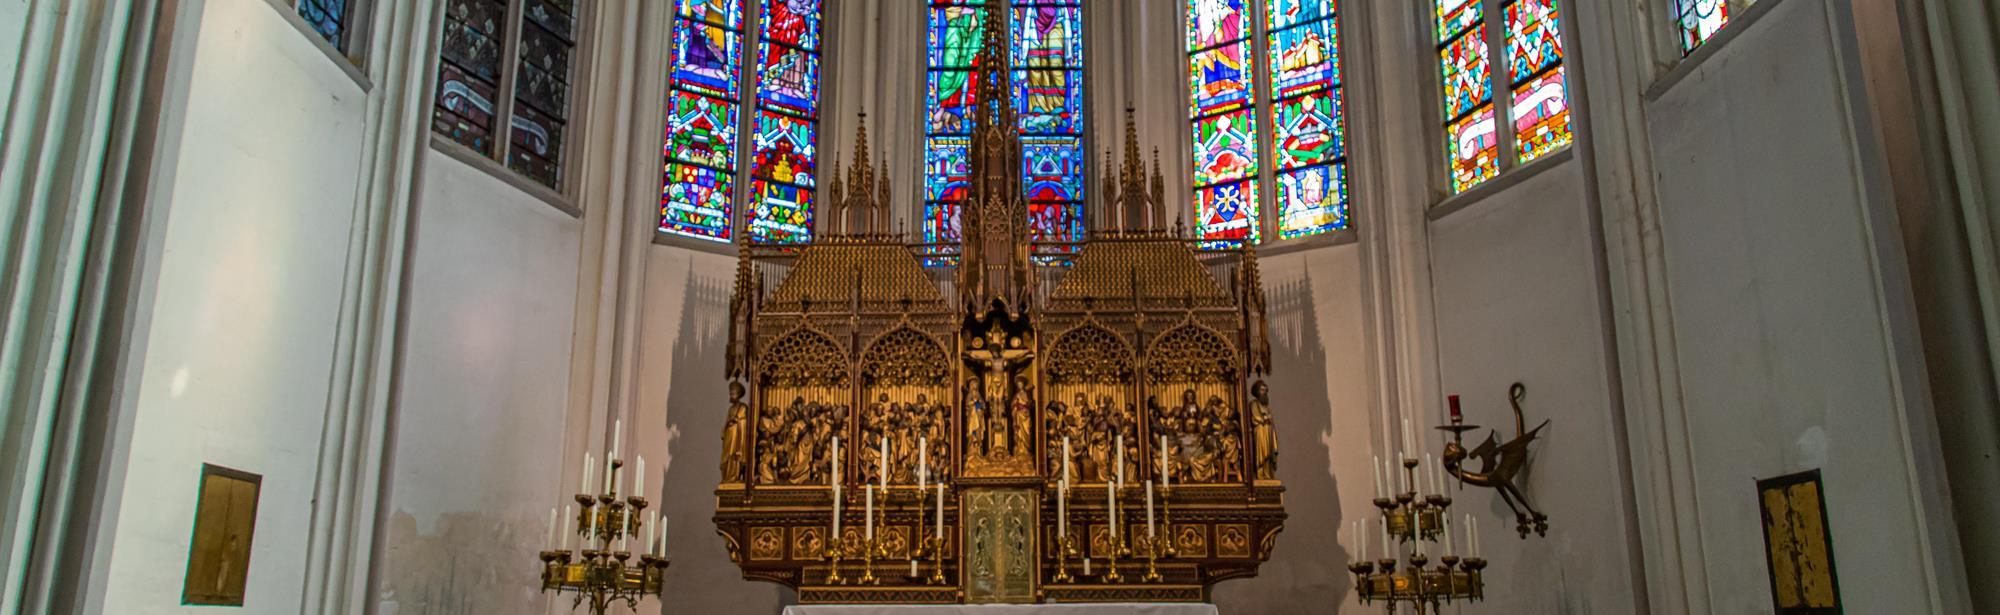 St. Petruskerk met fraaie schatkamer